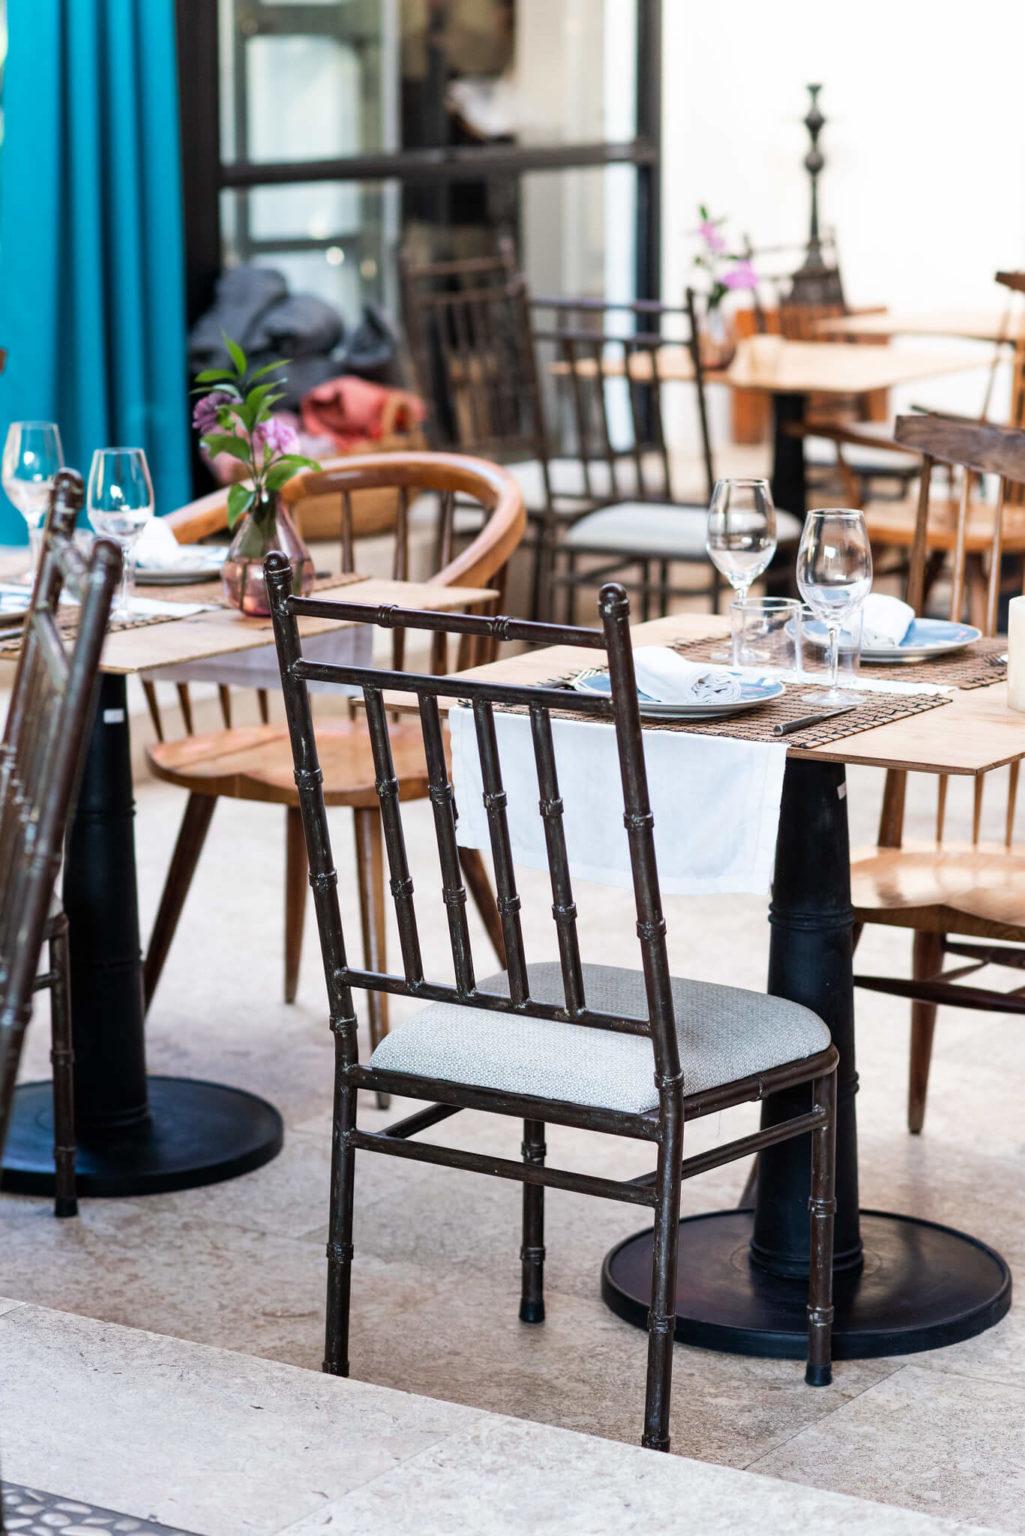 https://www.white-ibiza.com/wp-content/uploads/2020/03/ibiza-restaurants-the-giri-cafe-2020-02-1025x1536.jpg